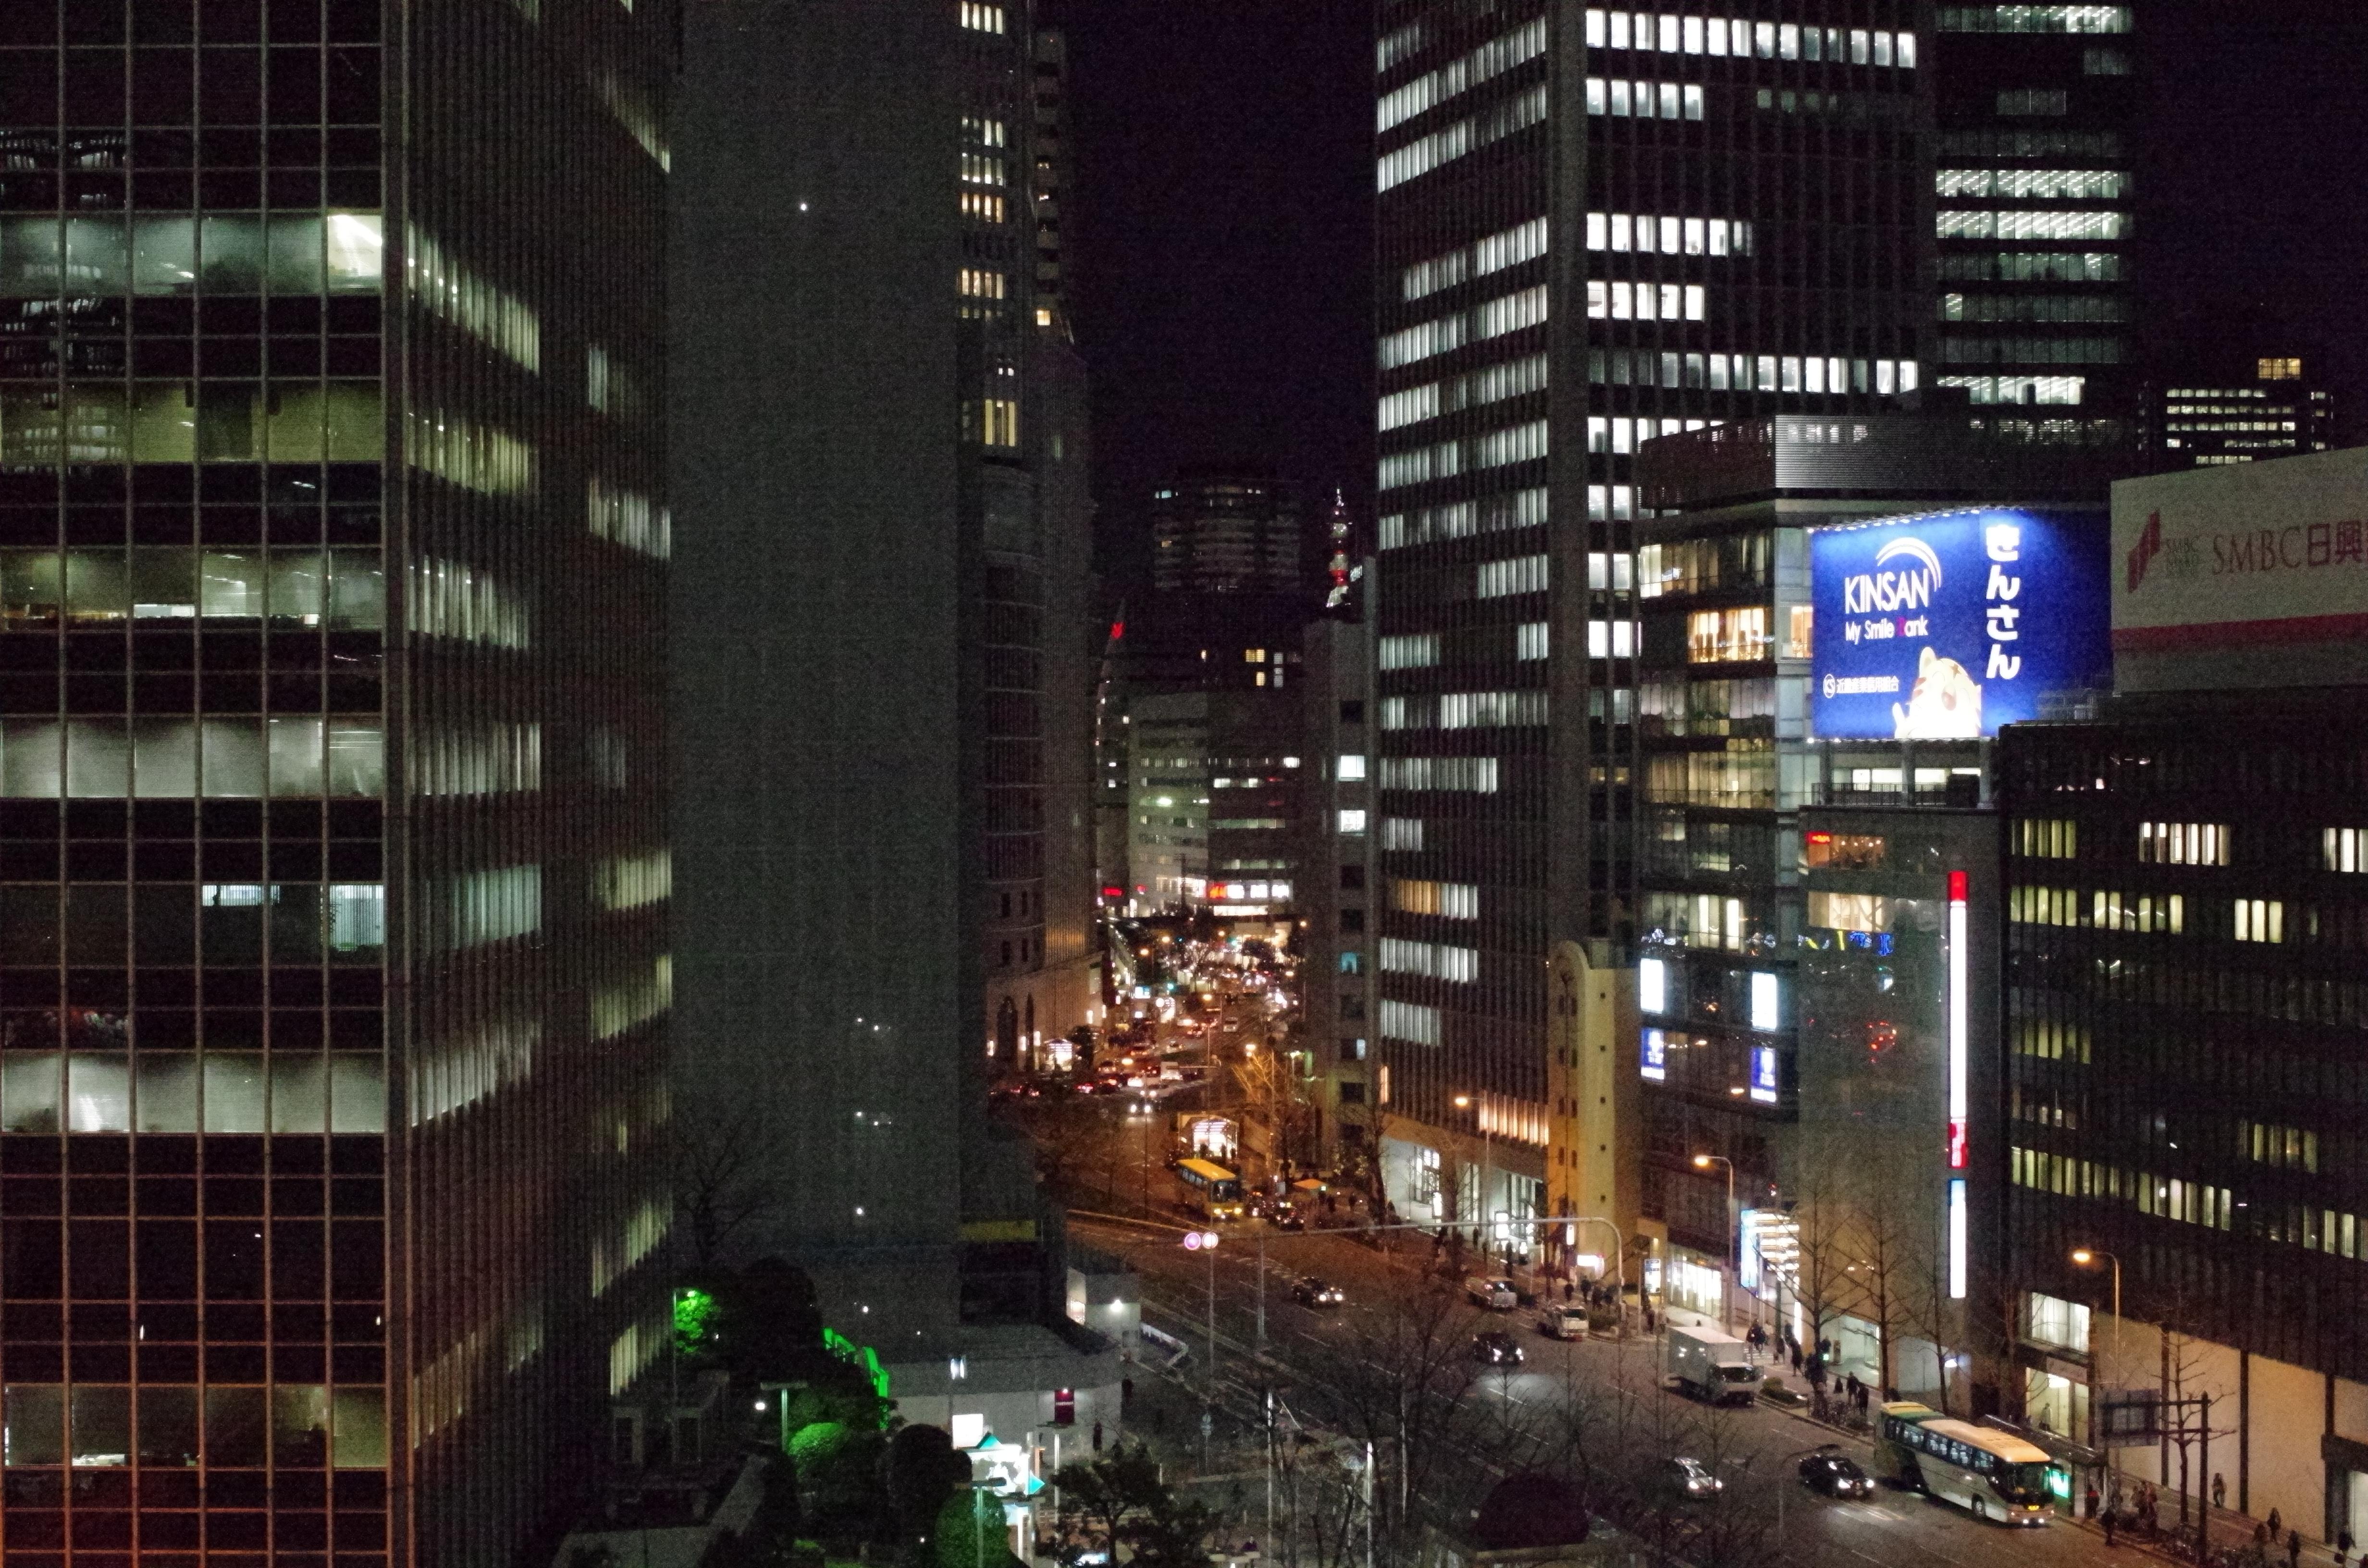 http://www.yaotomi.co.jp/blog/used/night-k5iis-25600.JPG